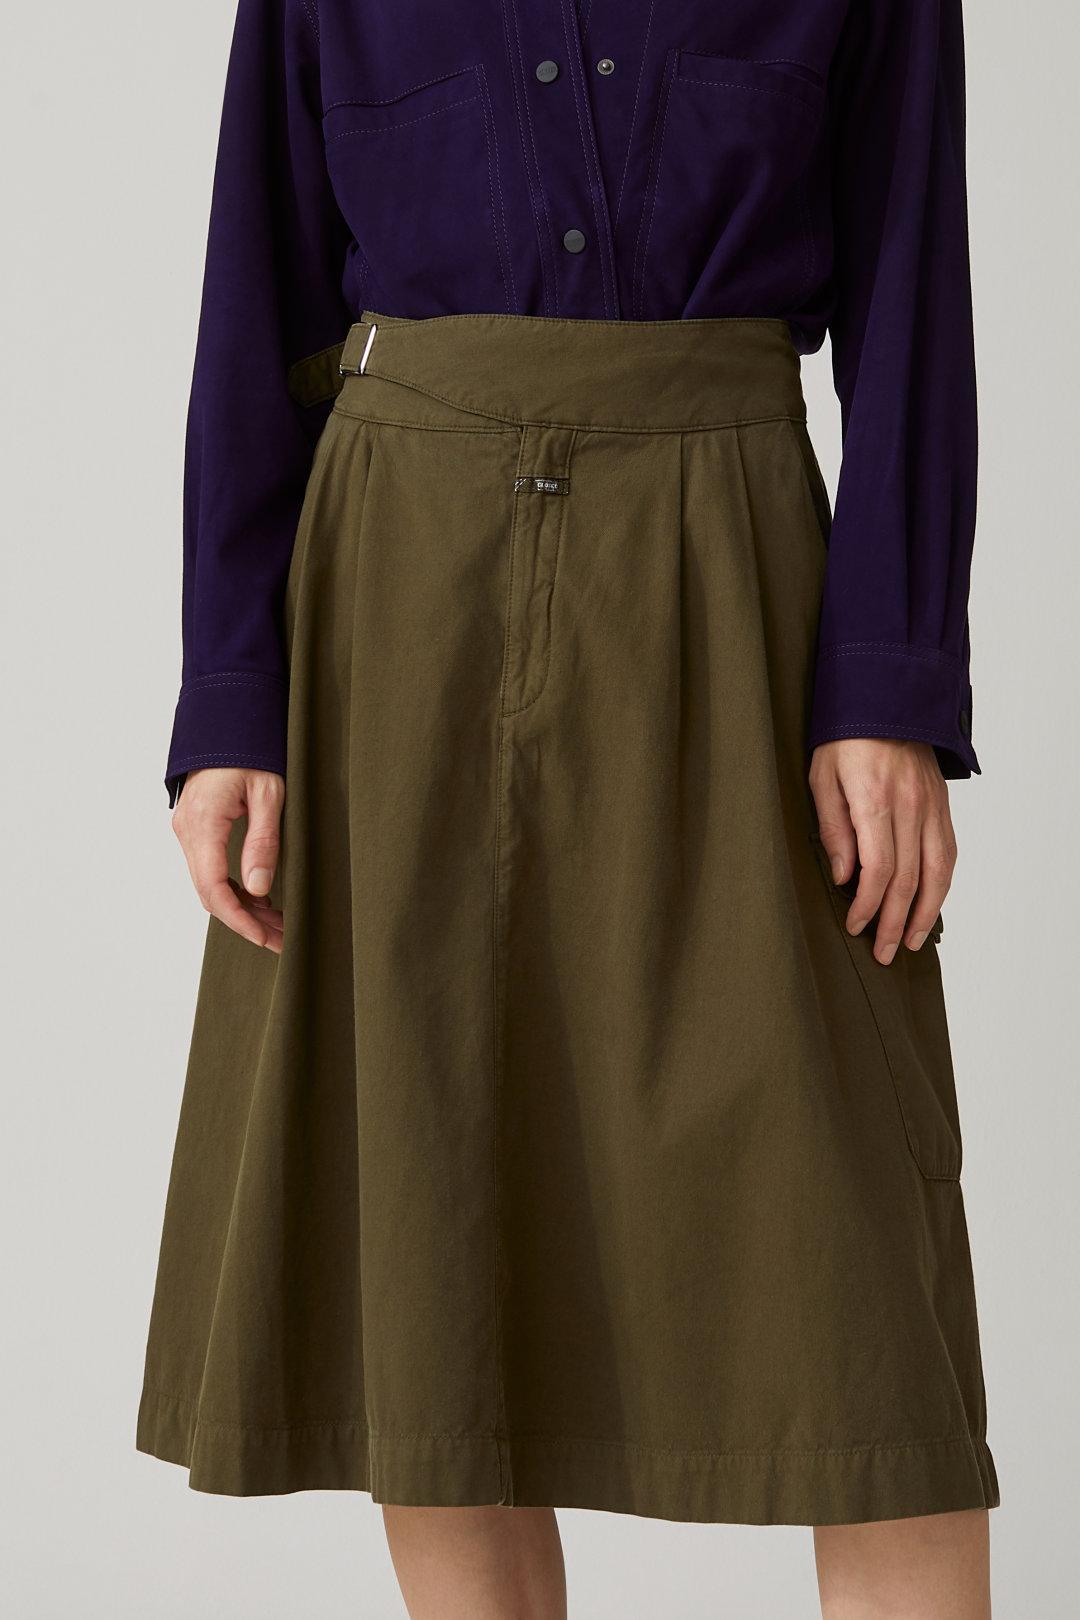 50% - Cotton Cargo Skirt - Closed